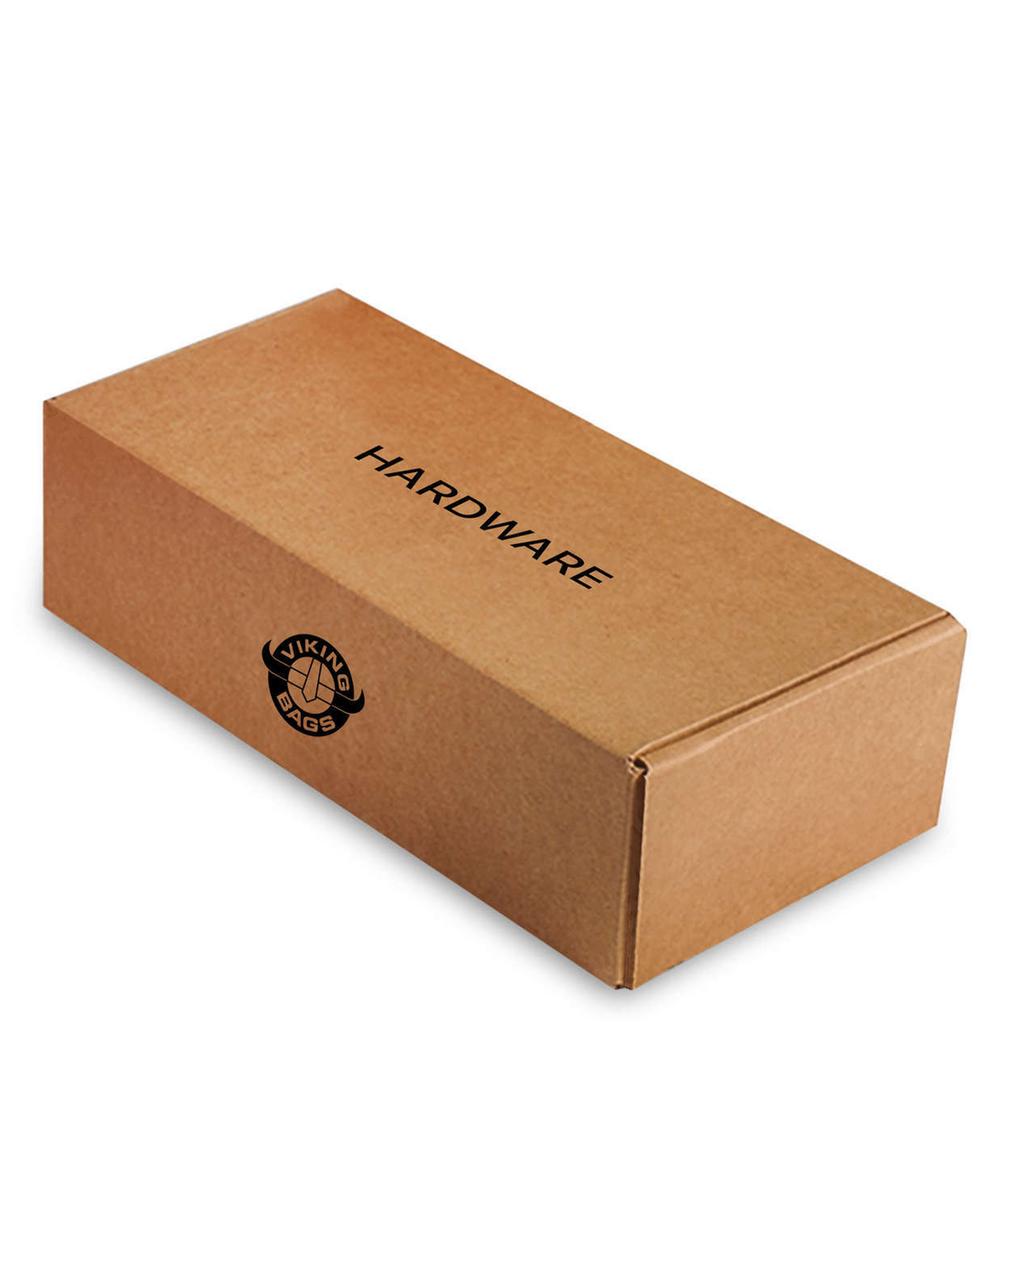 Honda VTX 1800 R Viking Raven Medium Leather Motorcycle Saddlebags Hardware Box